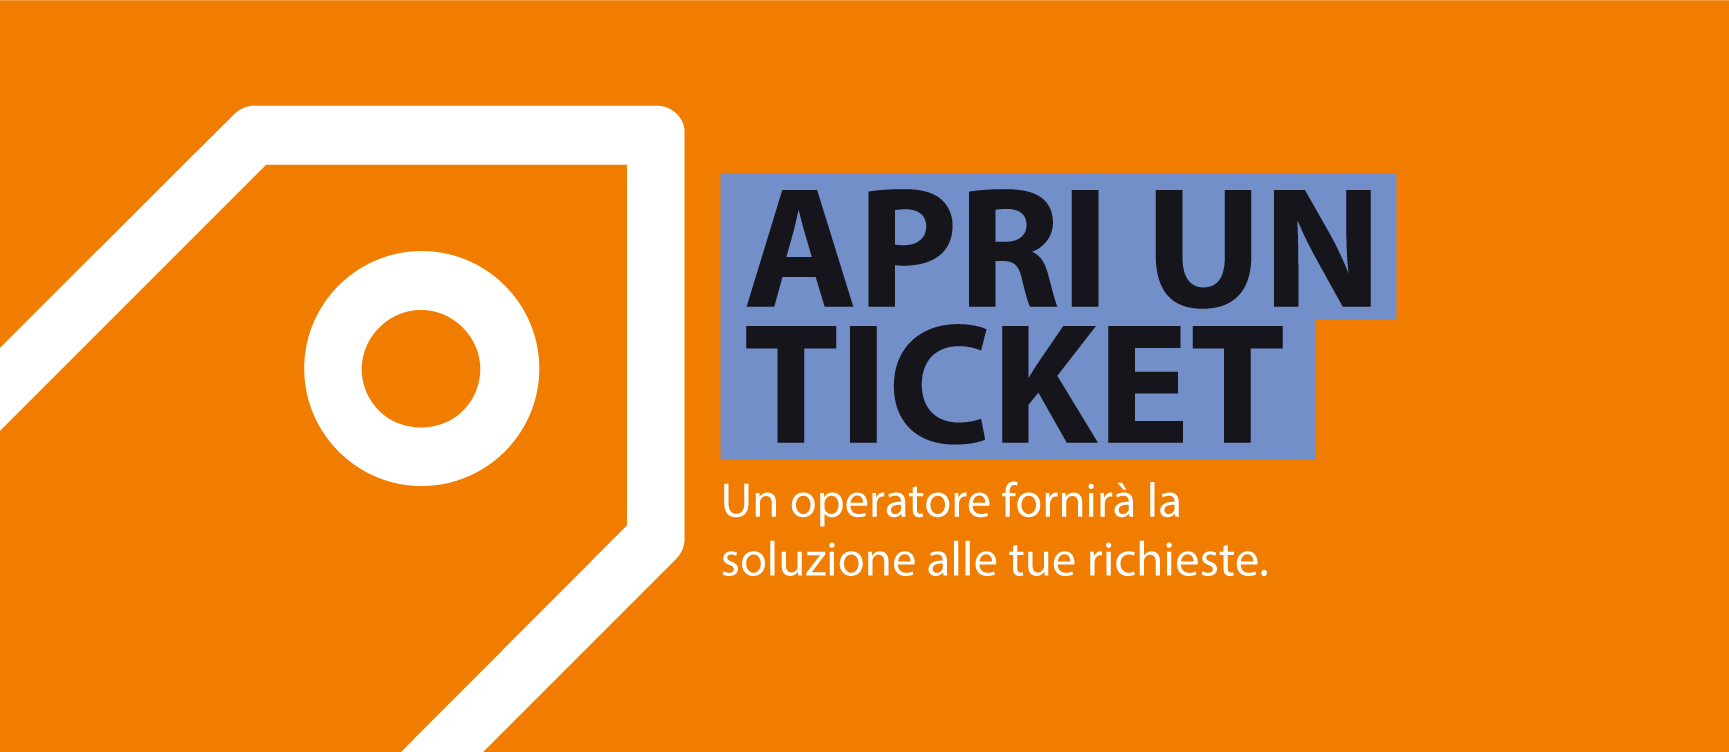 Apri il ticket